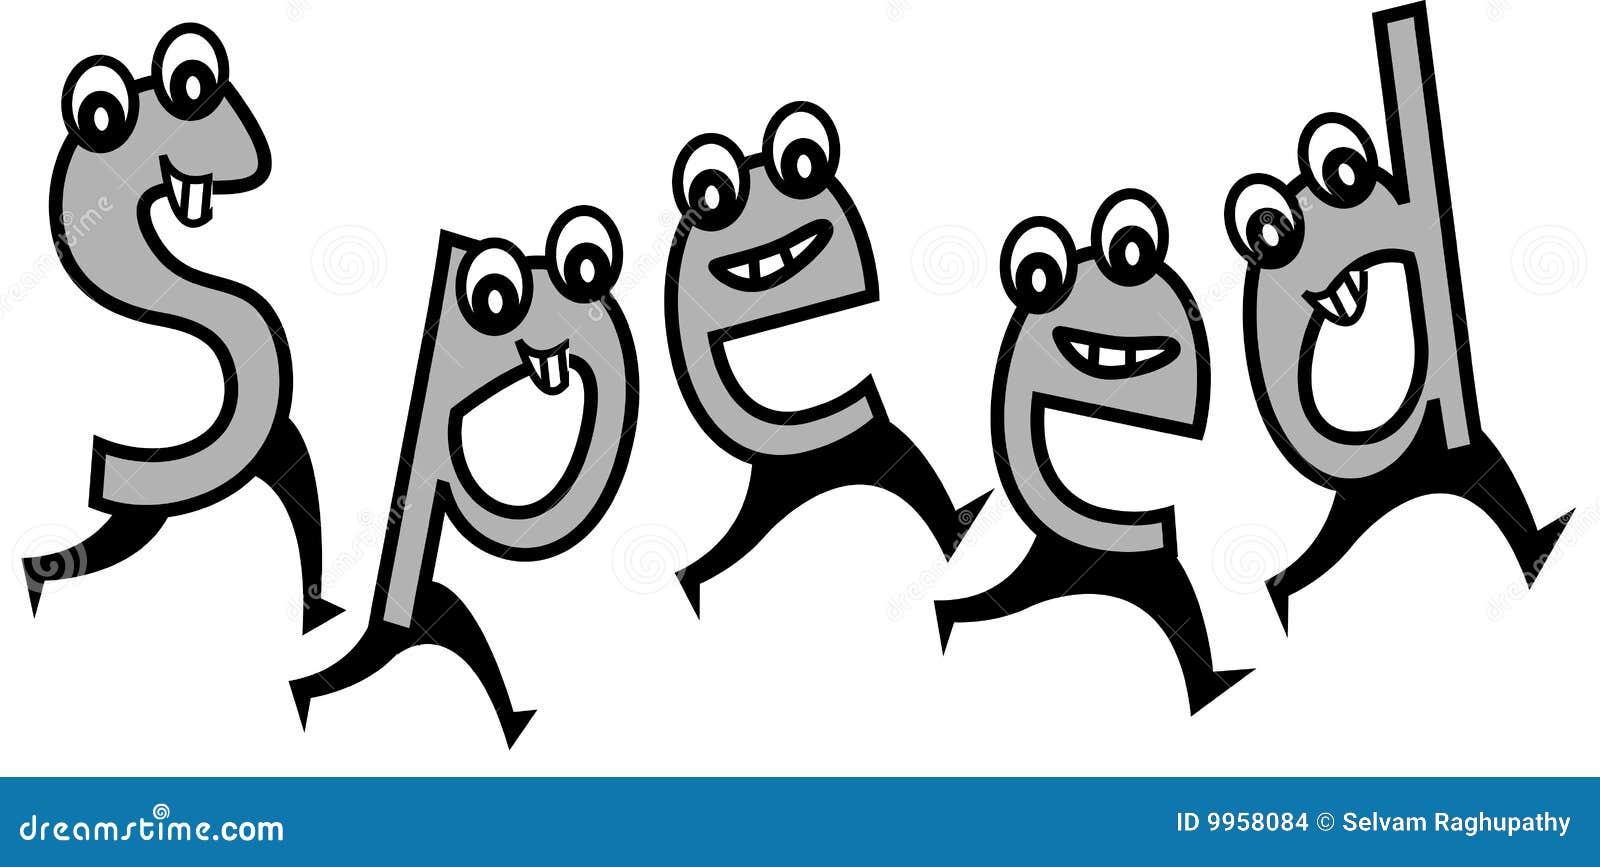 A6 Avant furthermore Jai mata di bumper stickers 128319726817774557 besides Classic california script logo bumper sticker 128797690311874668 together with The best vitamin for a christian is b1 bumper sticker 128993095060272062 likewise I love to write bumper sticker 128356925382694142. on car production line